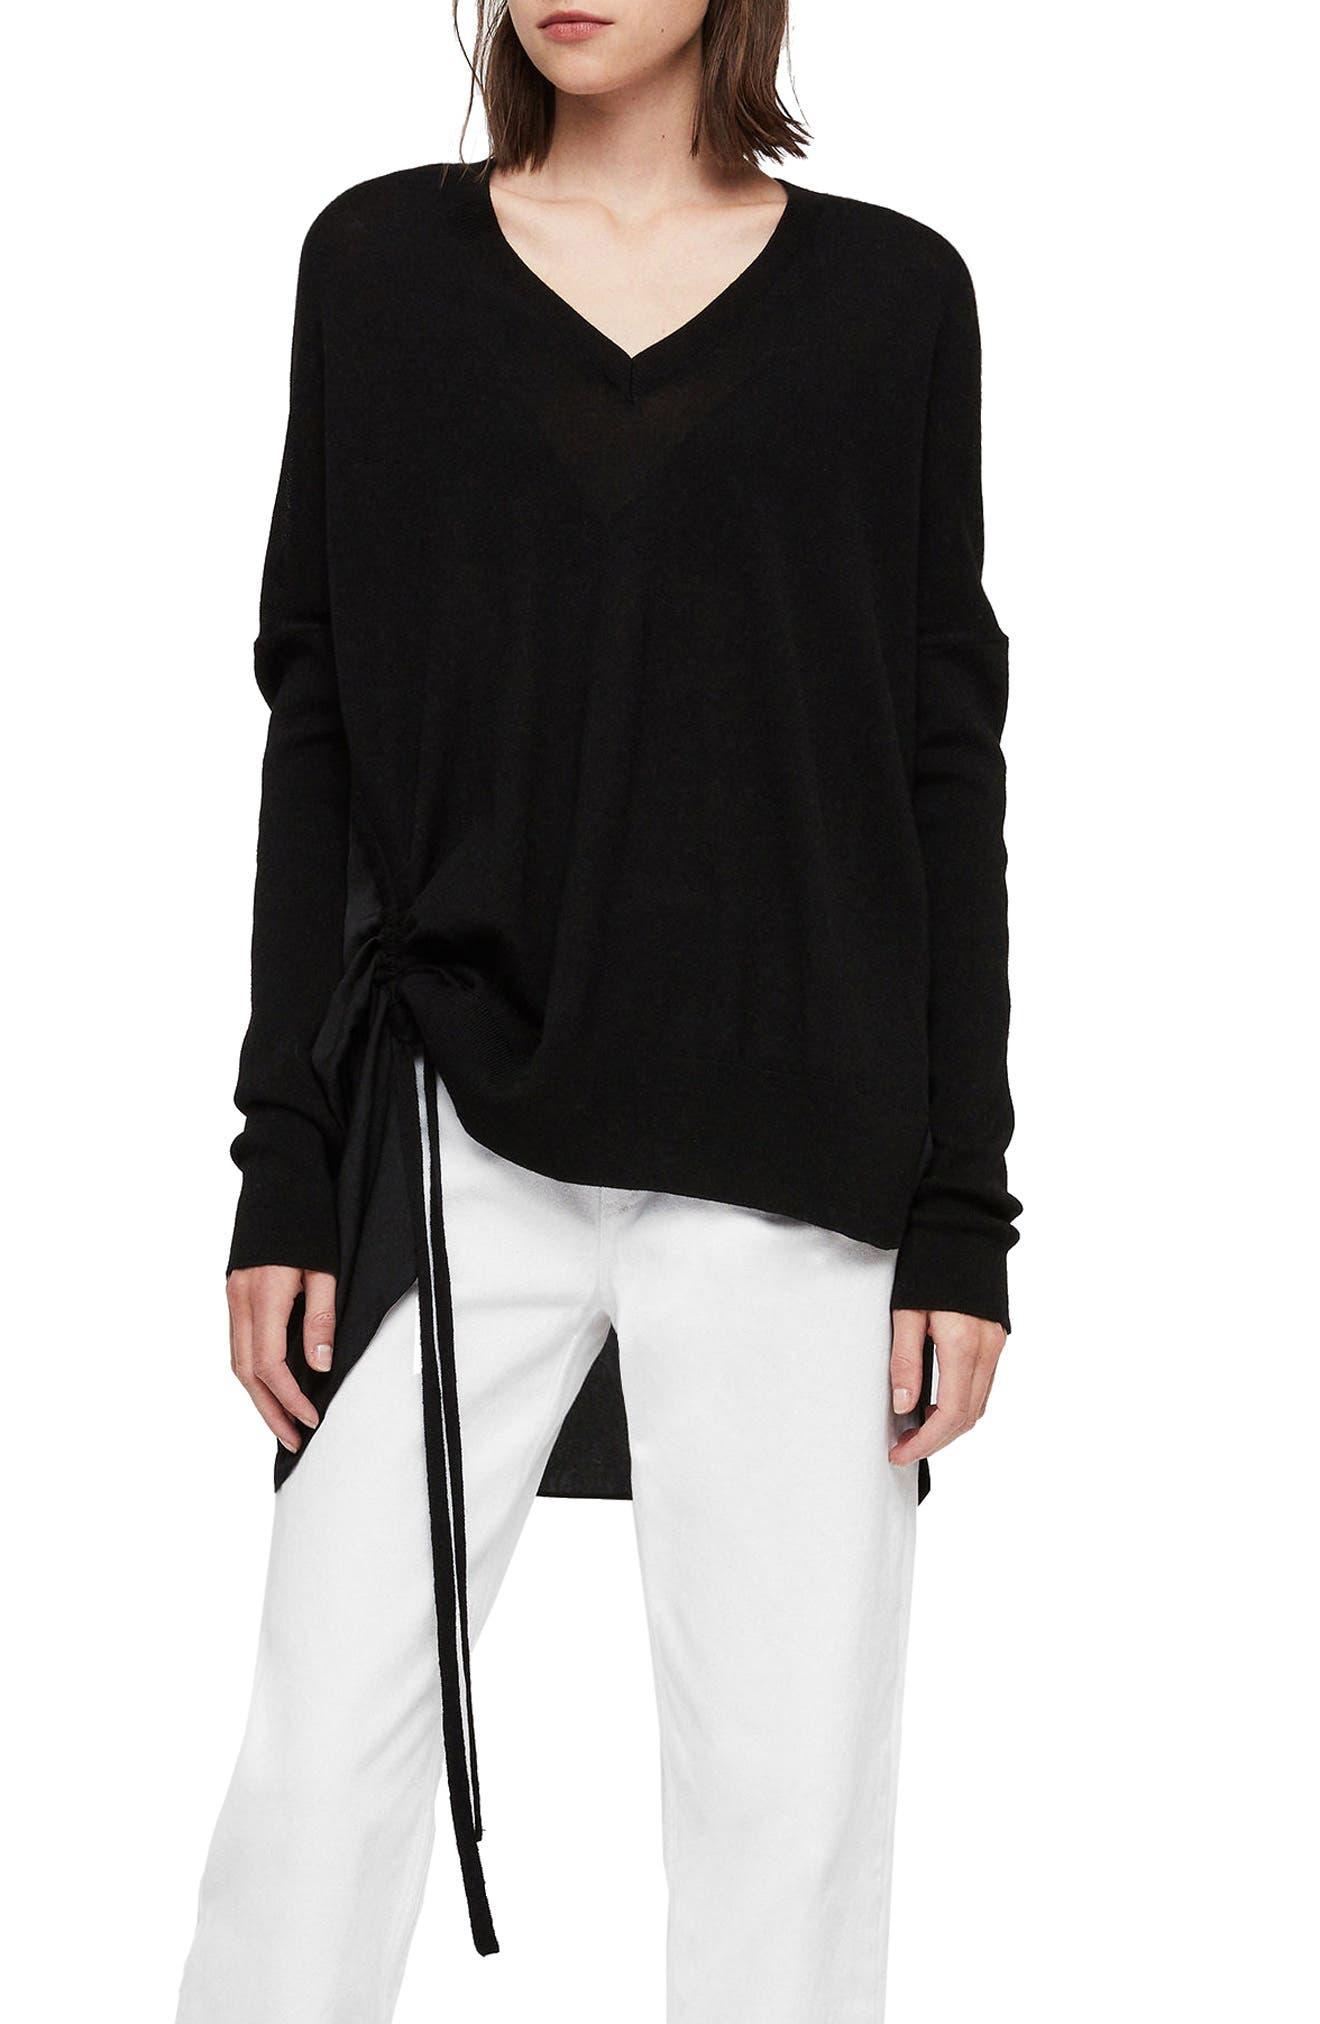 ALLSAINTS, Moira V-Neck Sweater, Main thumbnail 1, color, 001